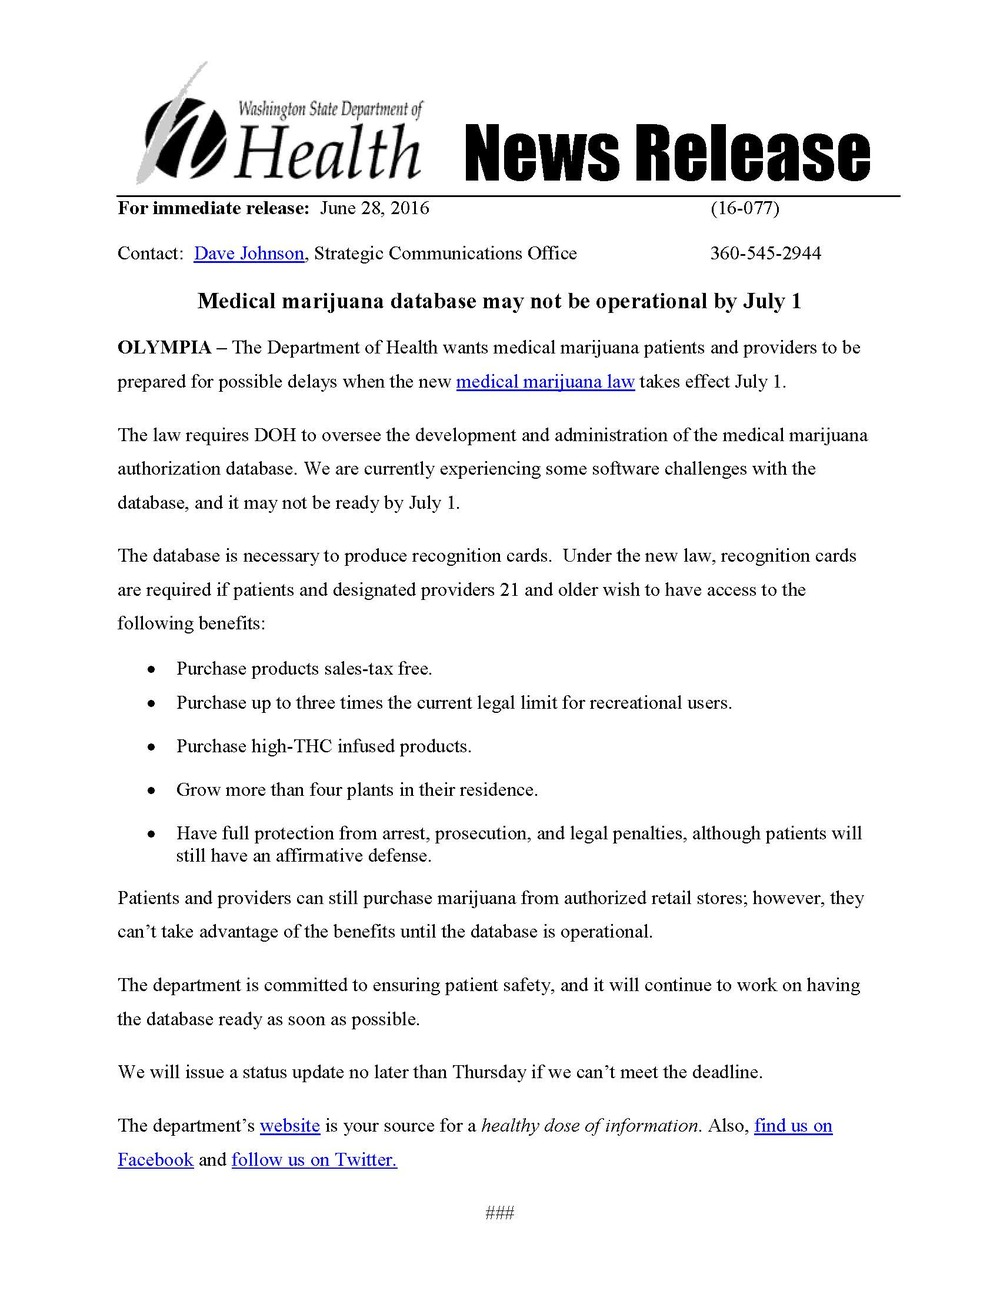 Washington Department of Health Medical Marijuana News Release